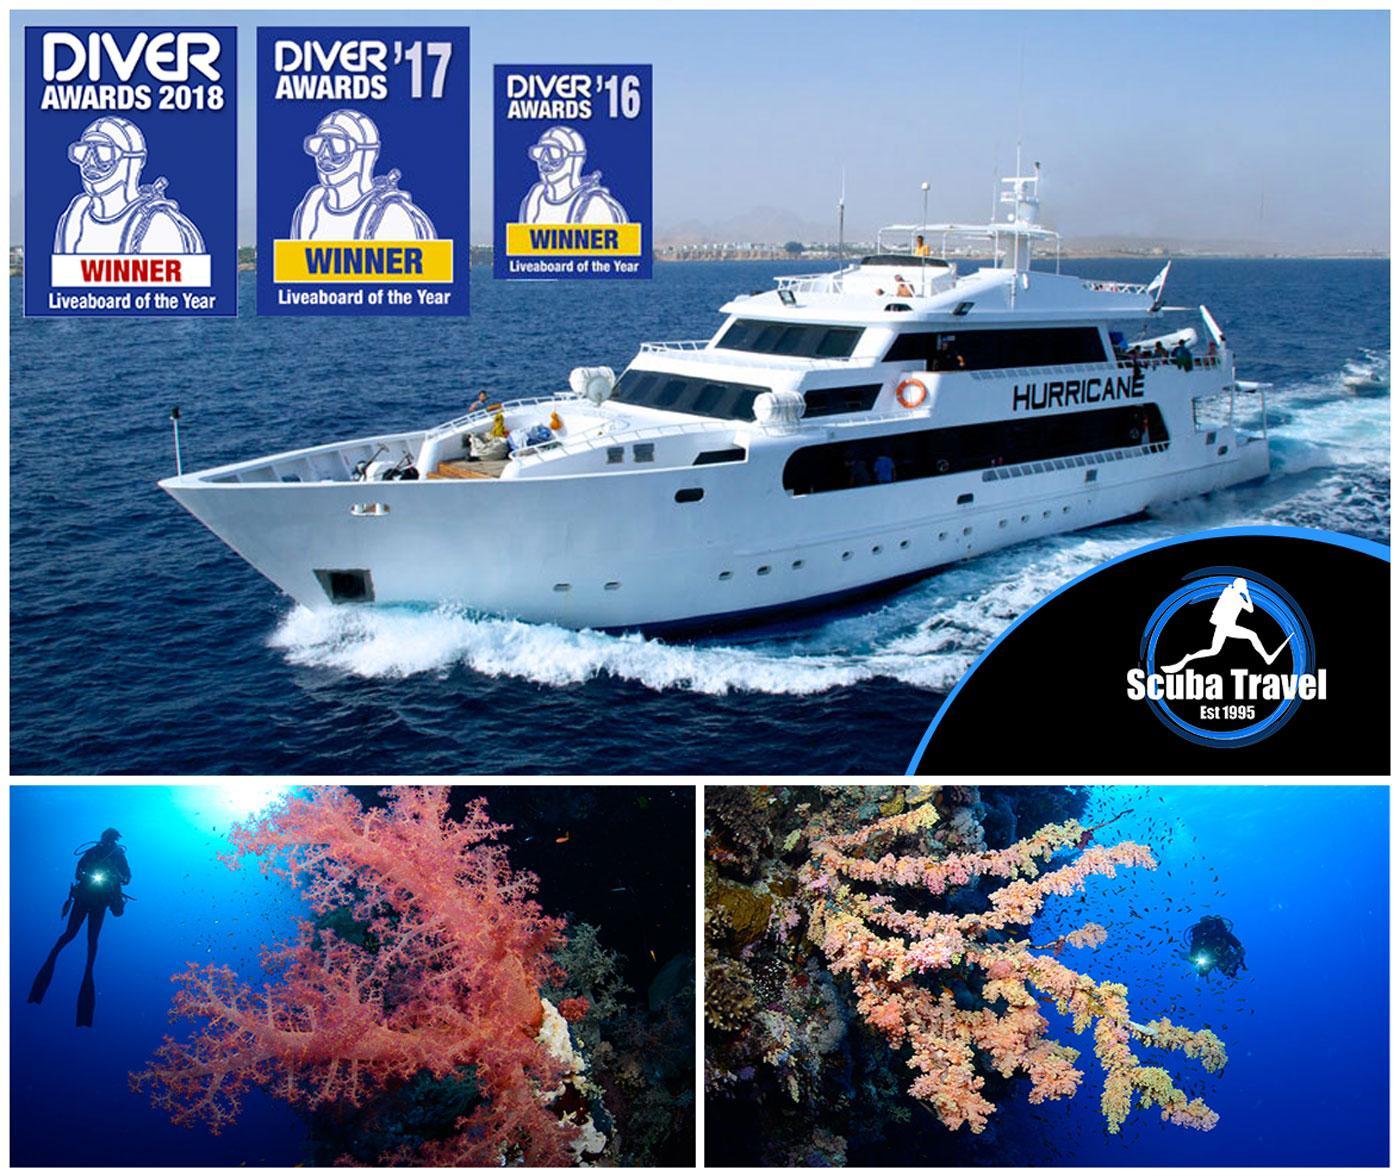 Scuba Travel, Red Sea, Hurricane,